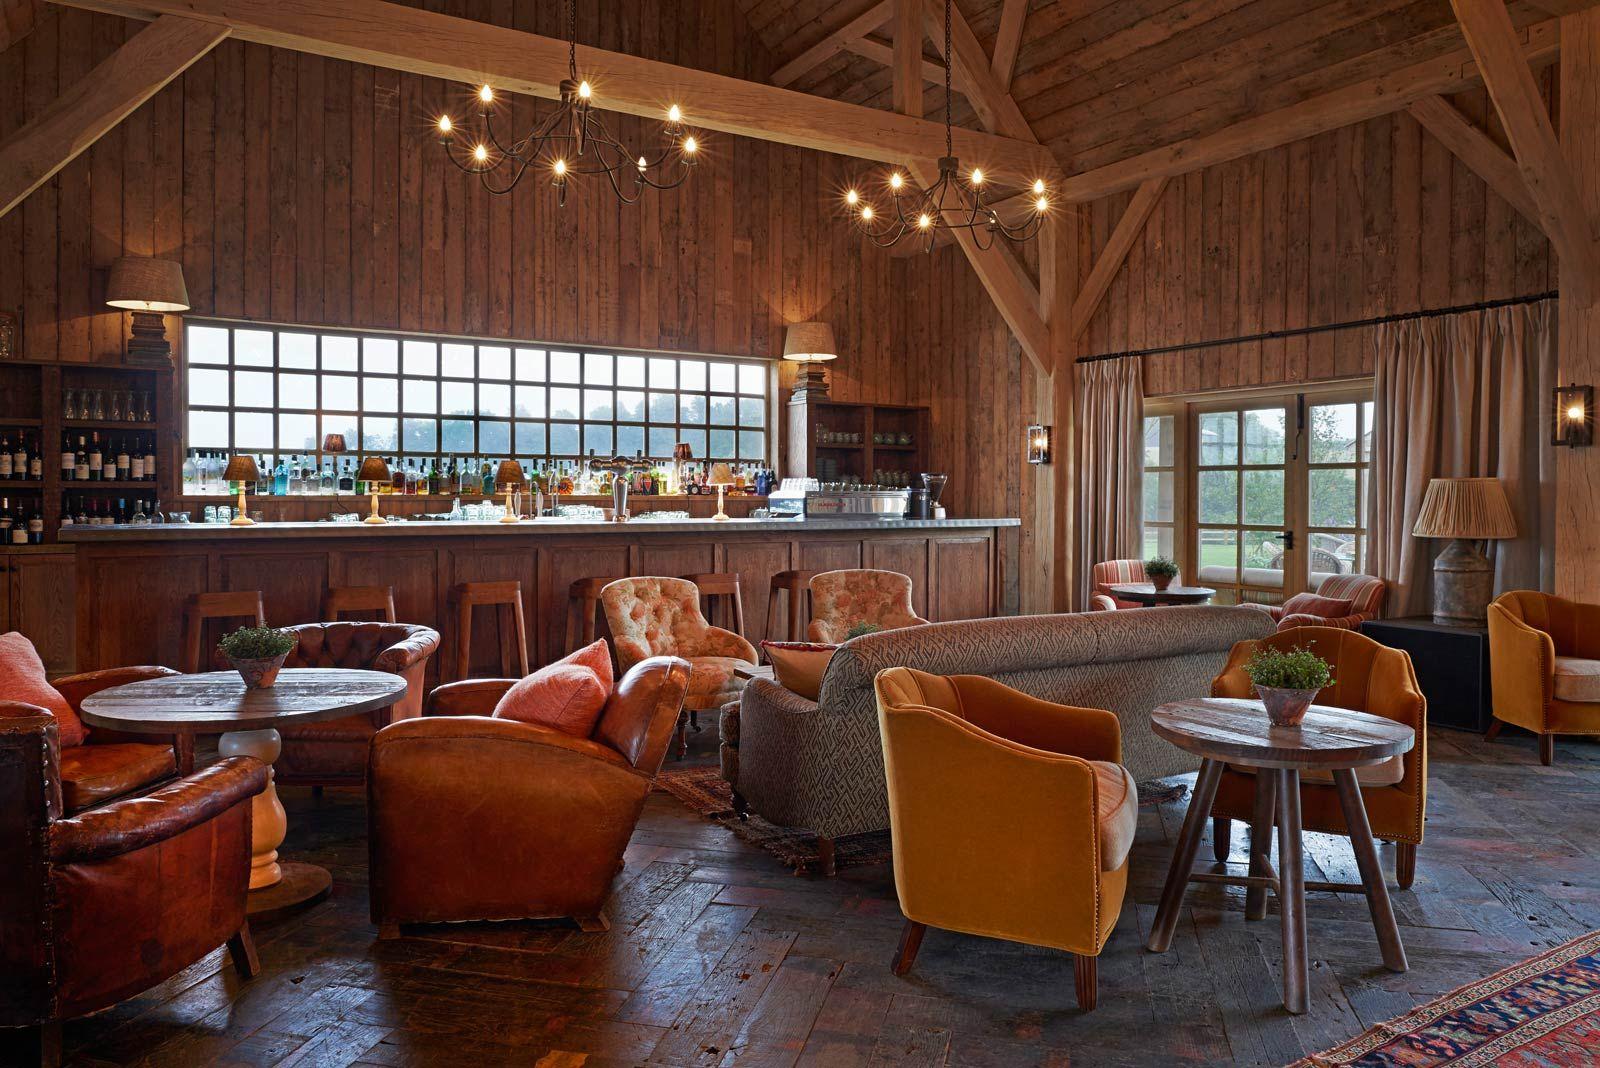 The Lovely New Soho Farmhouse In Oxfordshire Soho Farmhouse Soho House Farmhouse Restaurant